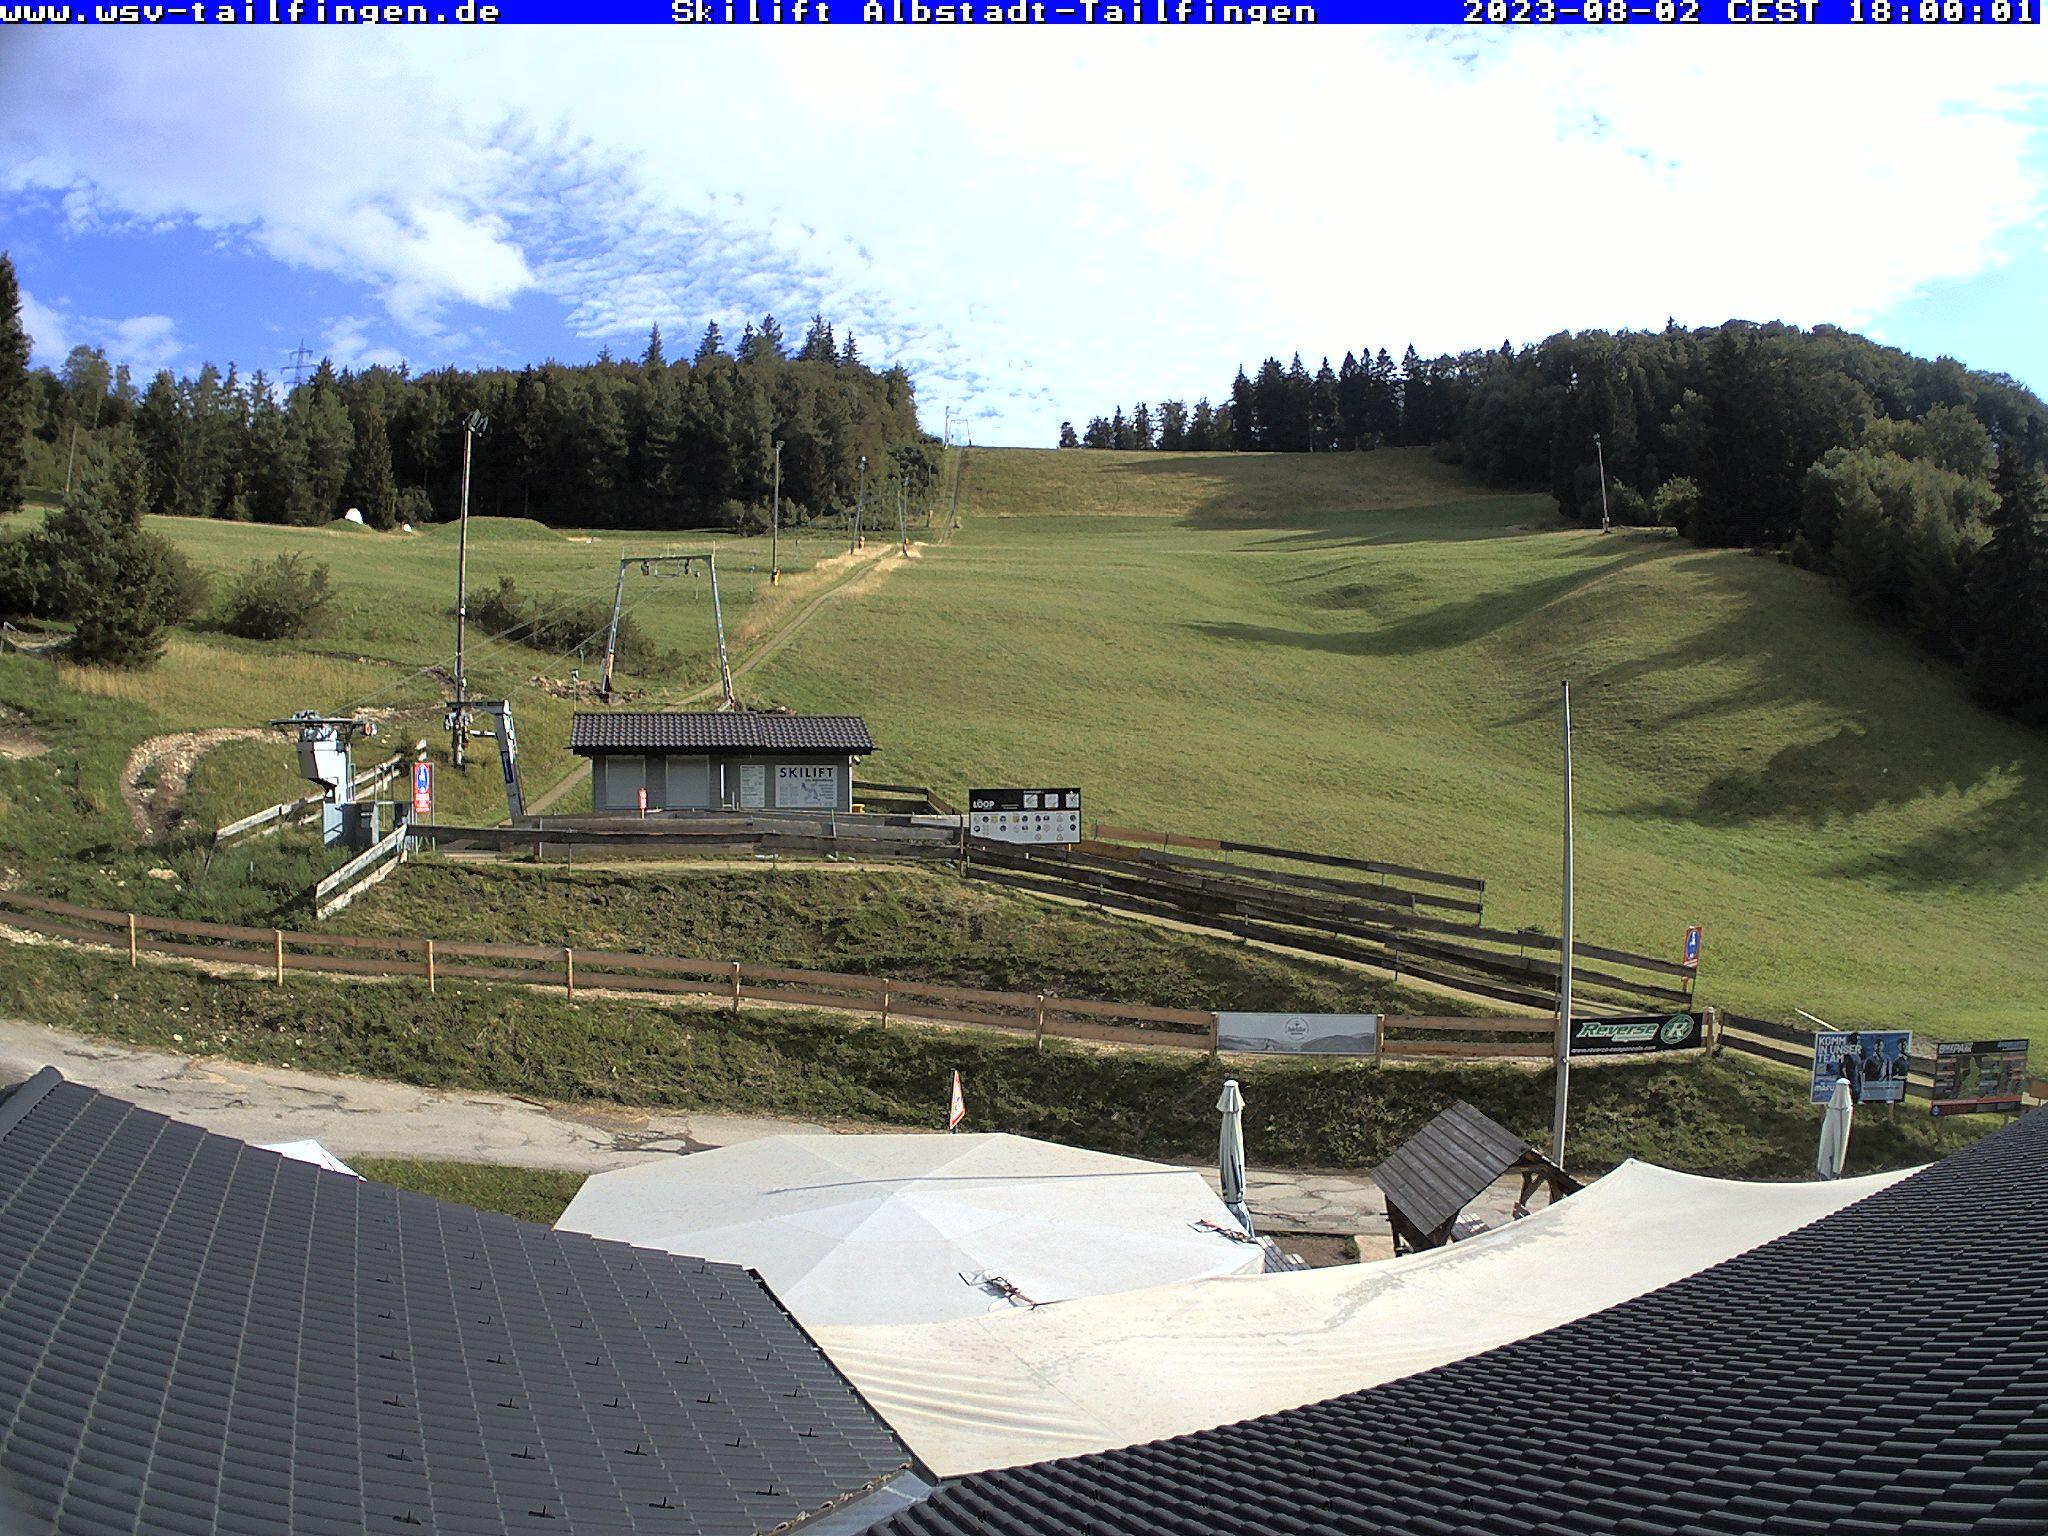 Webcam-Foto 18:00 Uhr / Skilift Albstadt-Tailfingen